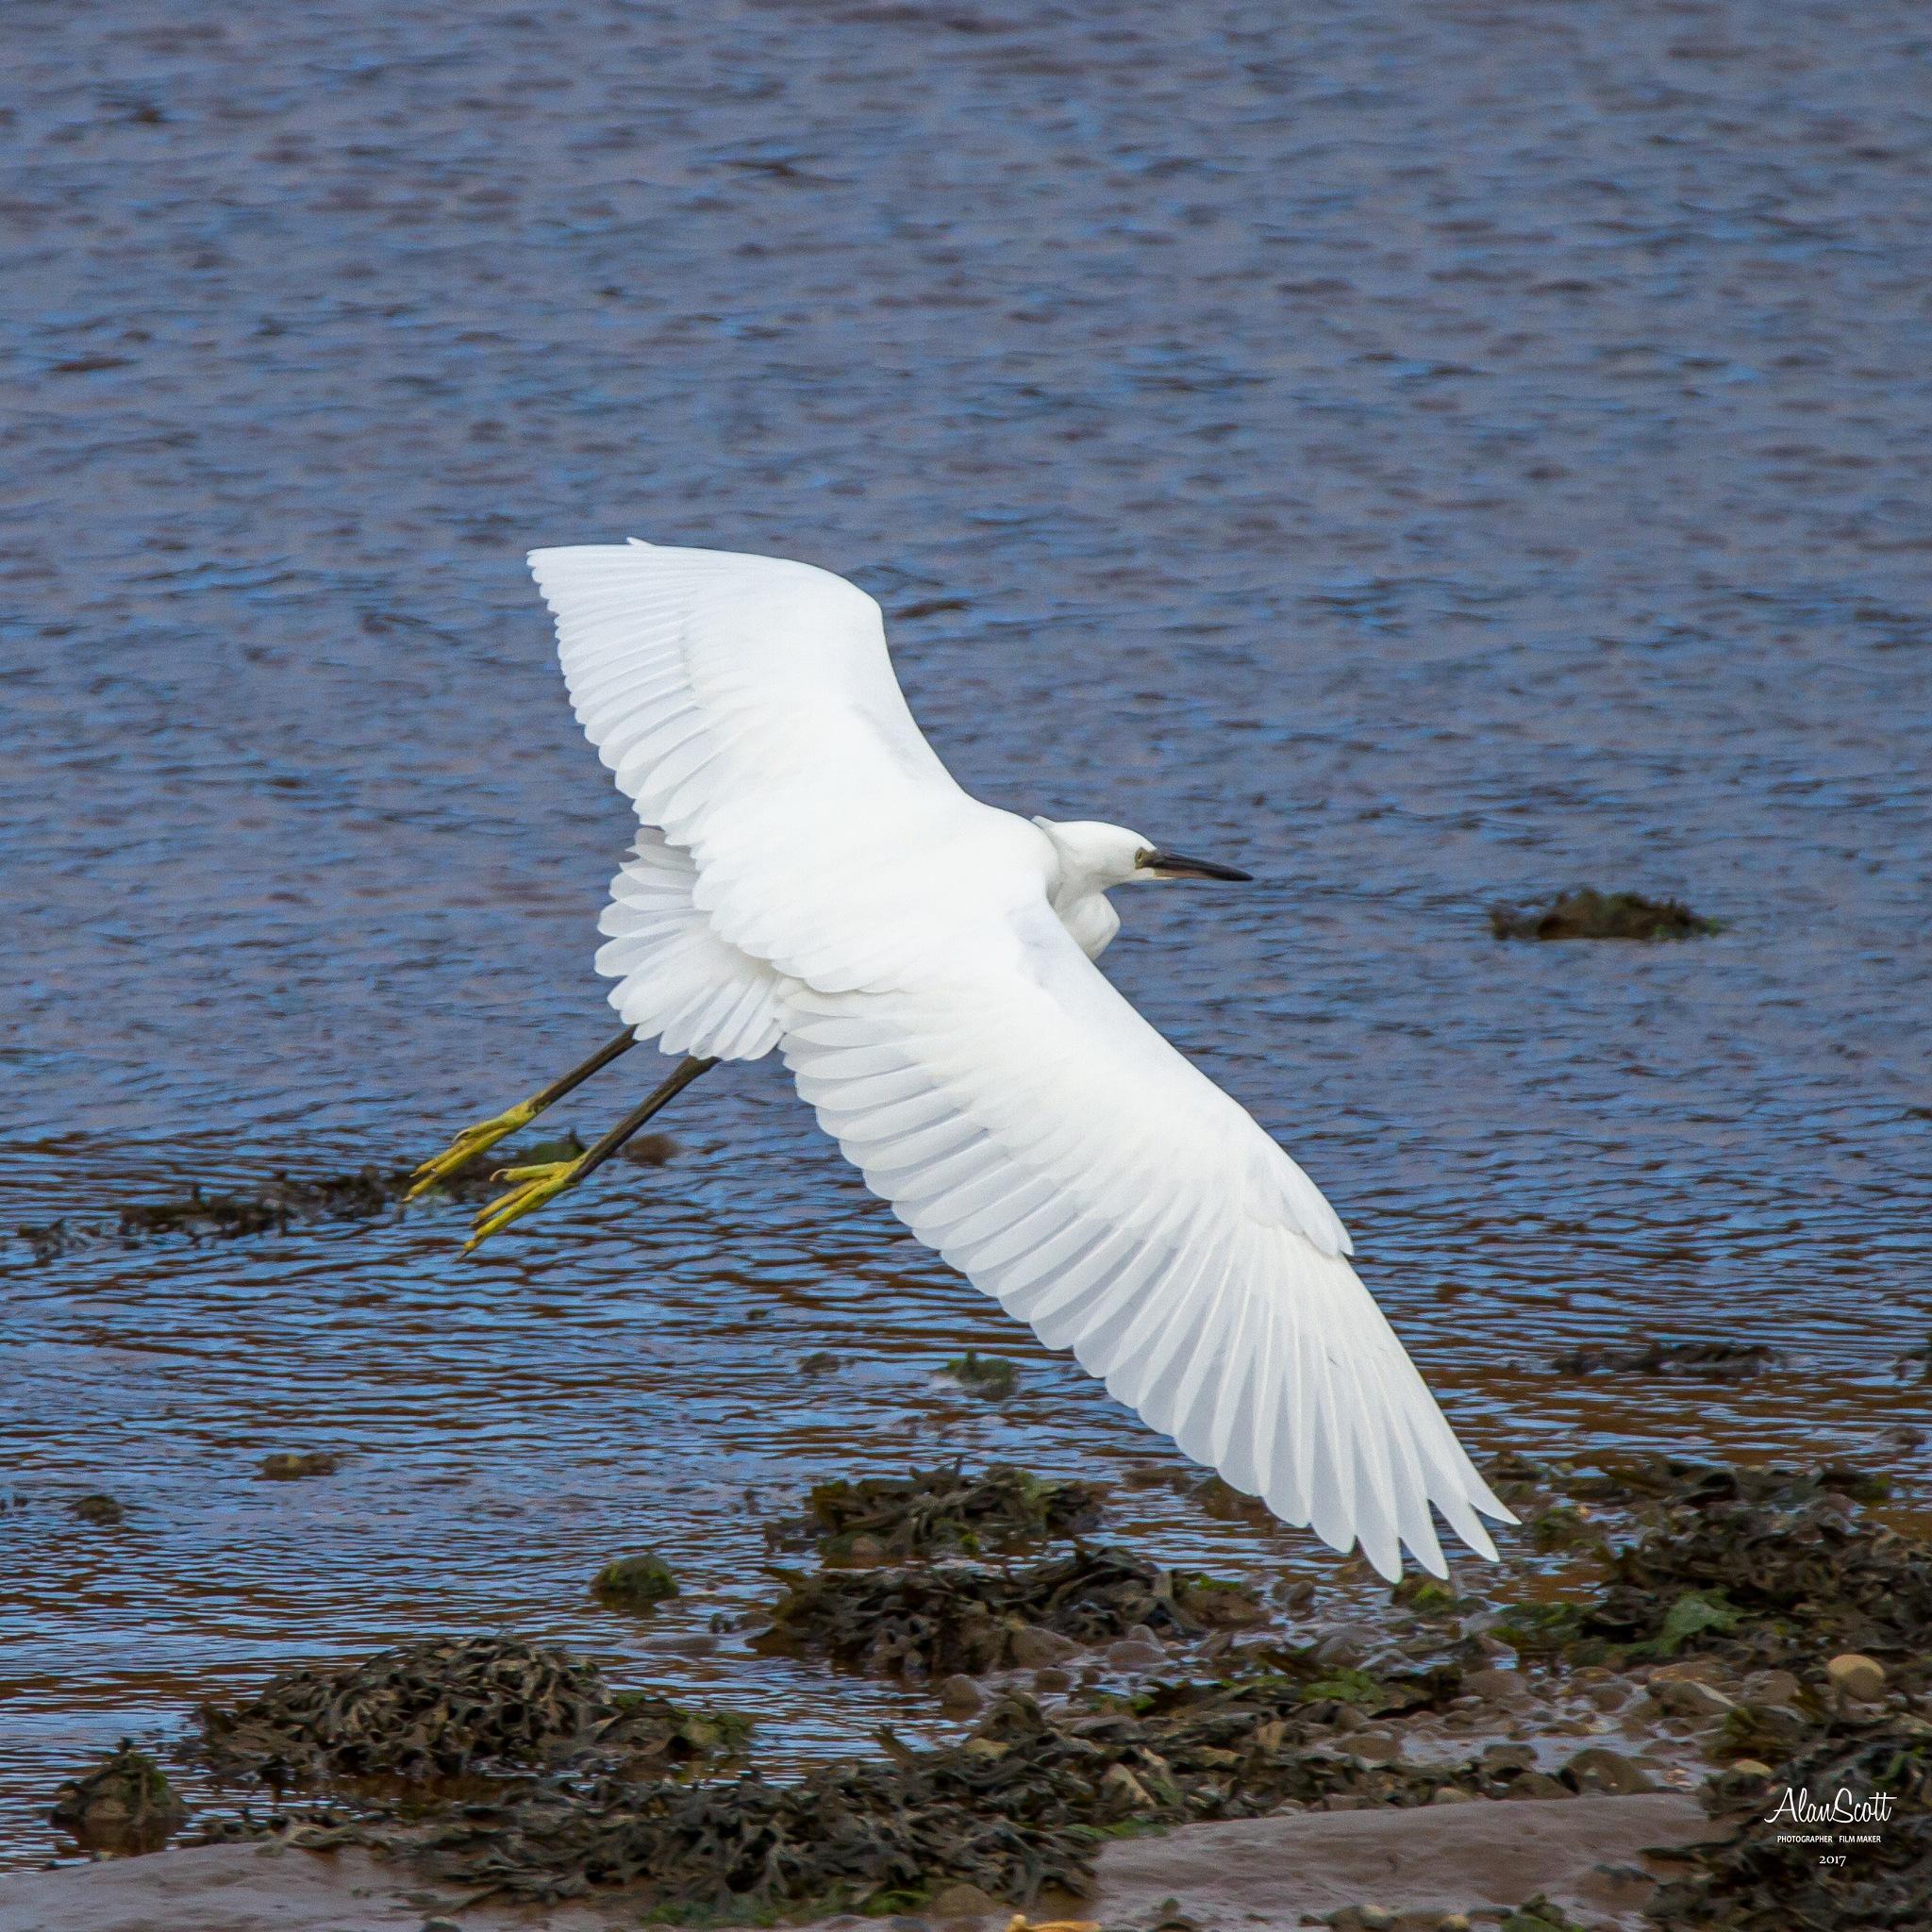 Egret by alanscott